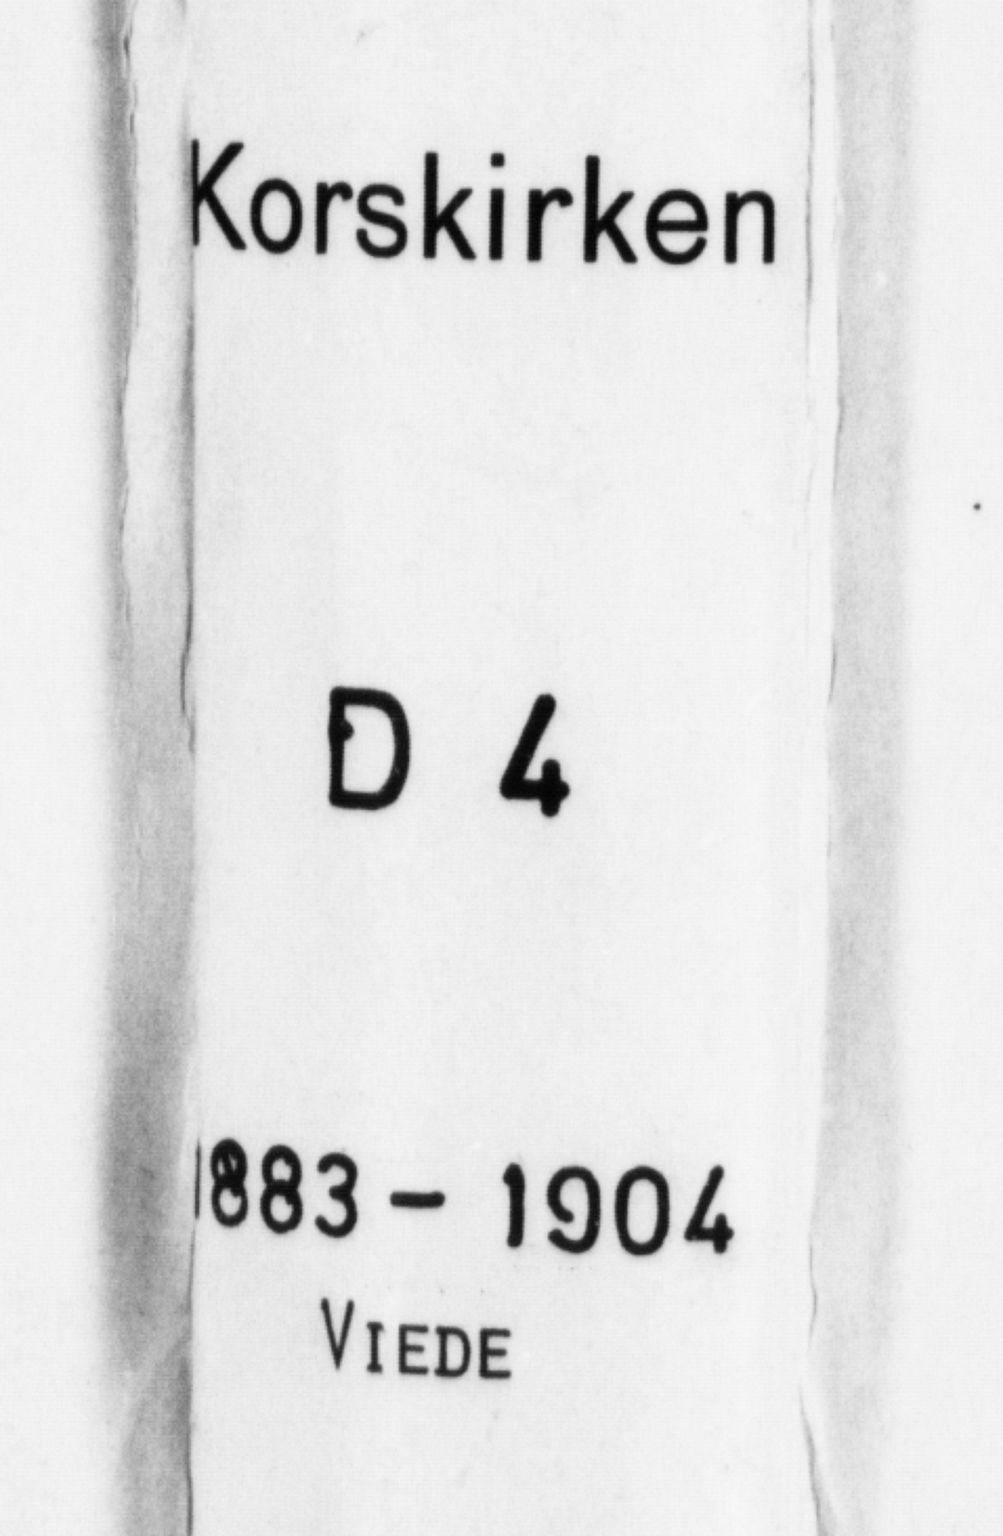 SAB, Korskirken Sokneprestembete, H/Haa/L0037: Ministerialbok nr. D 4, 1883-1904